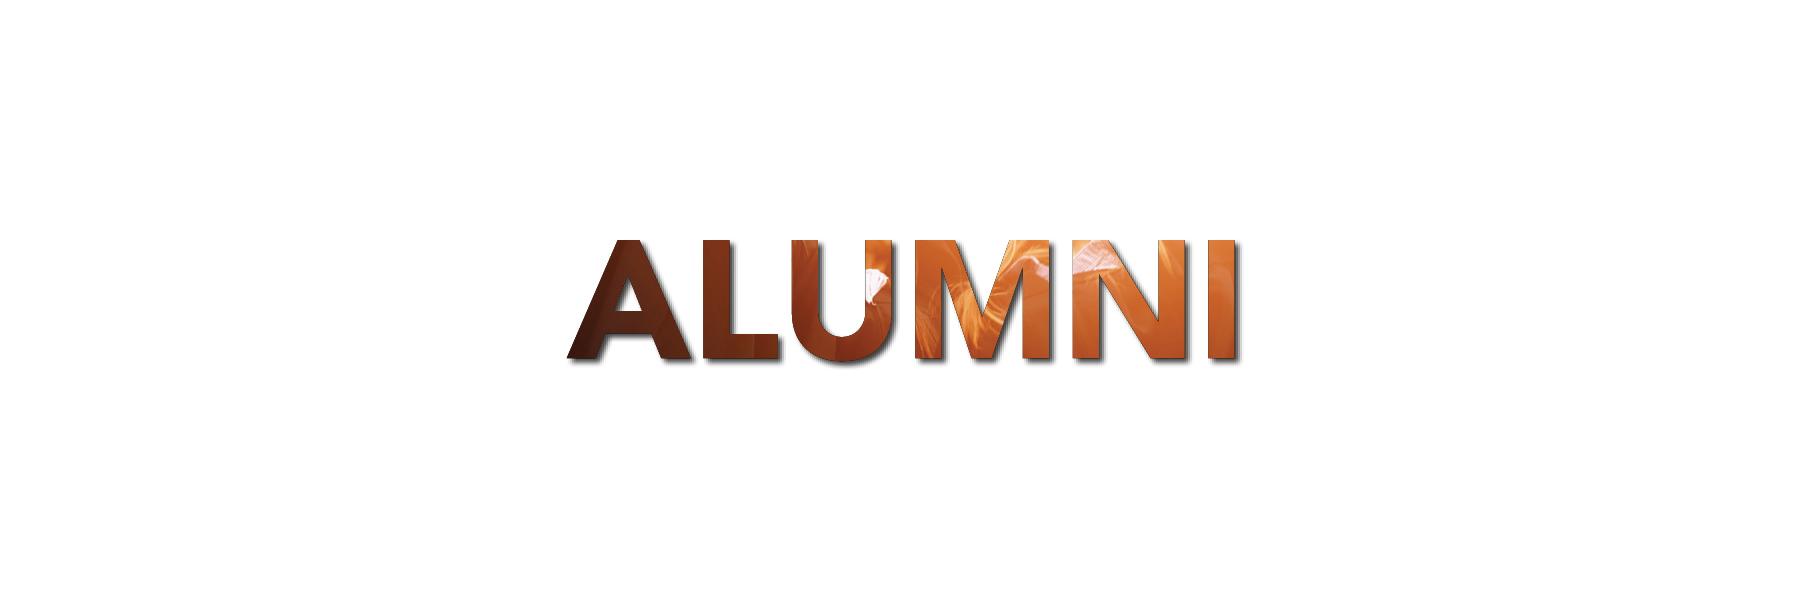 AlumniTitle.jpg